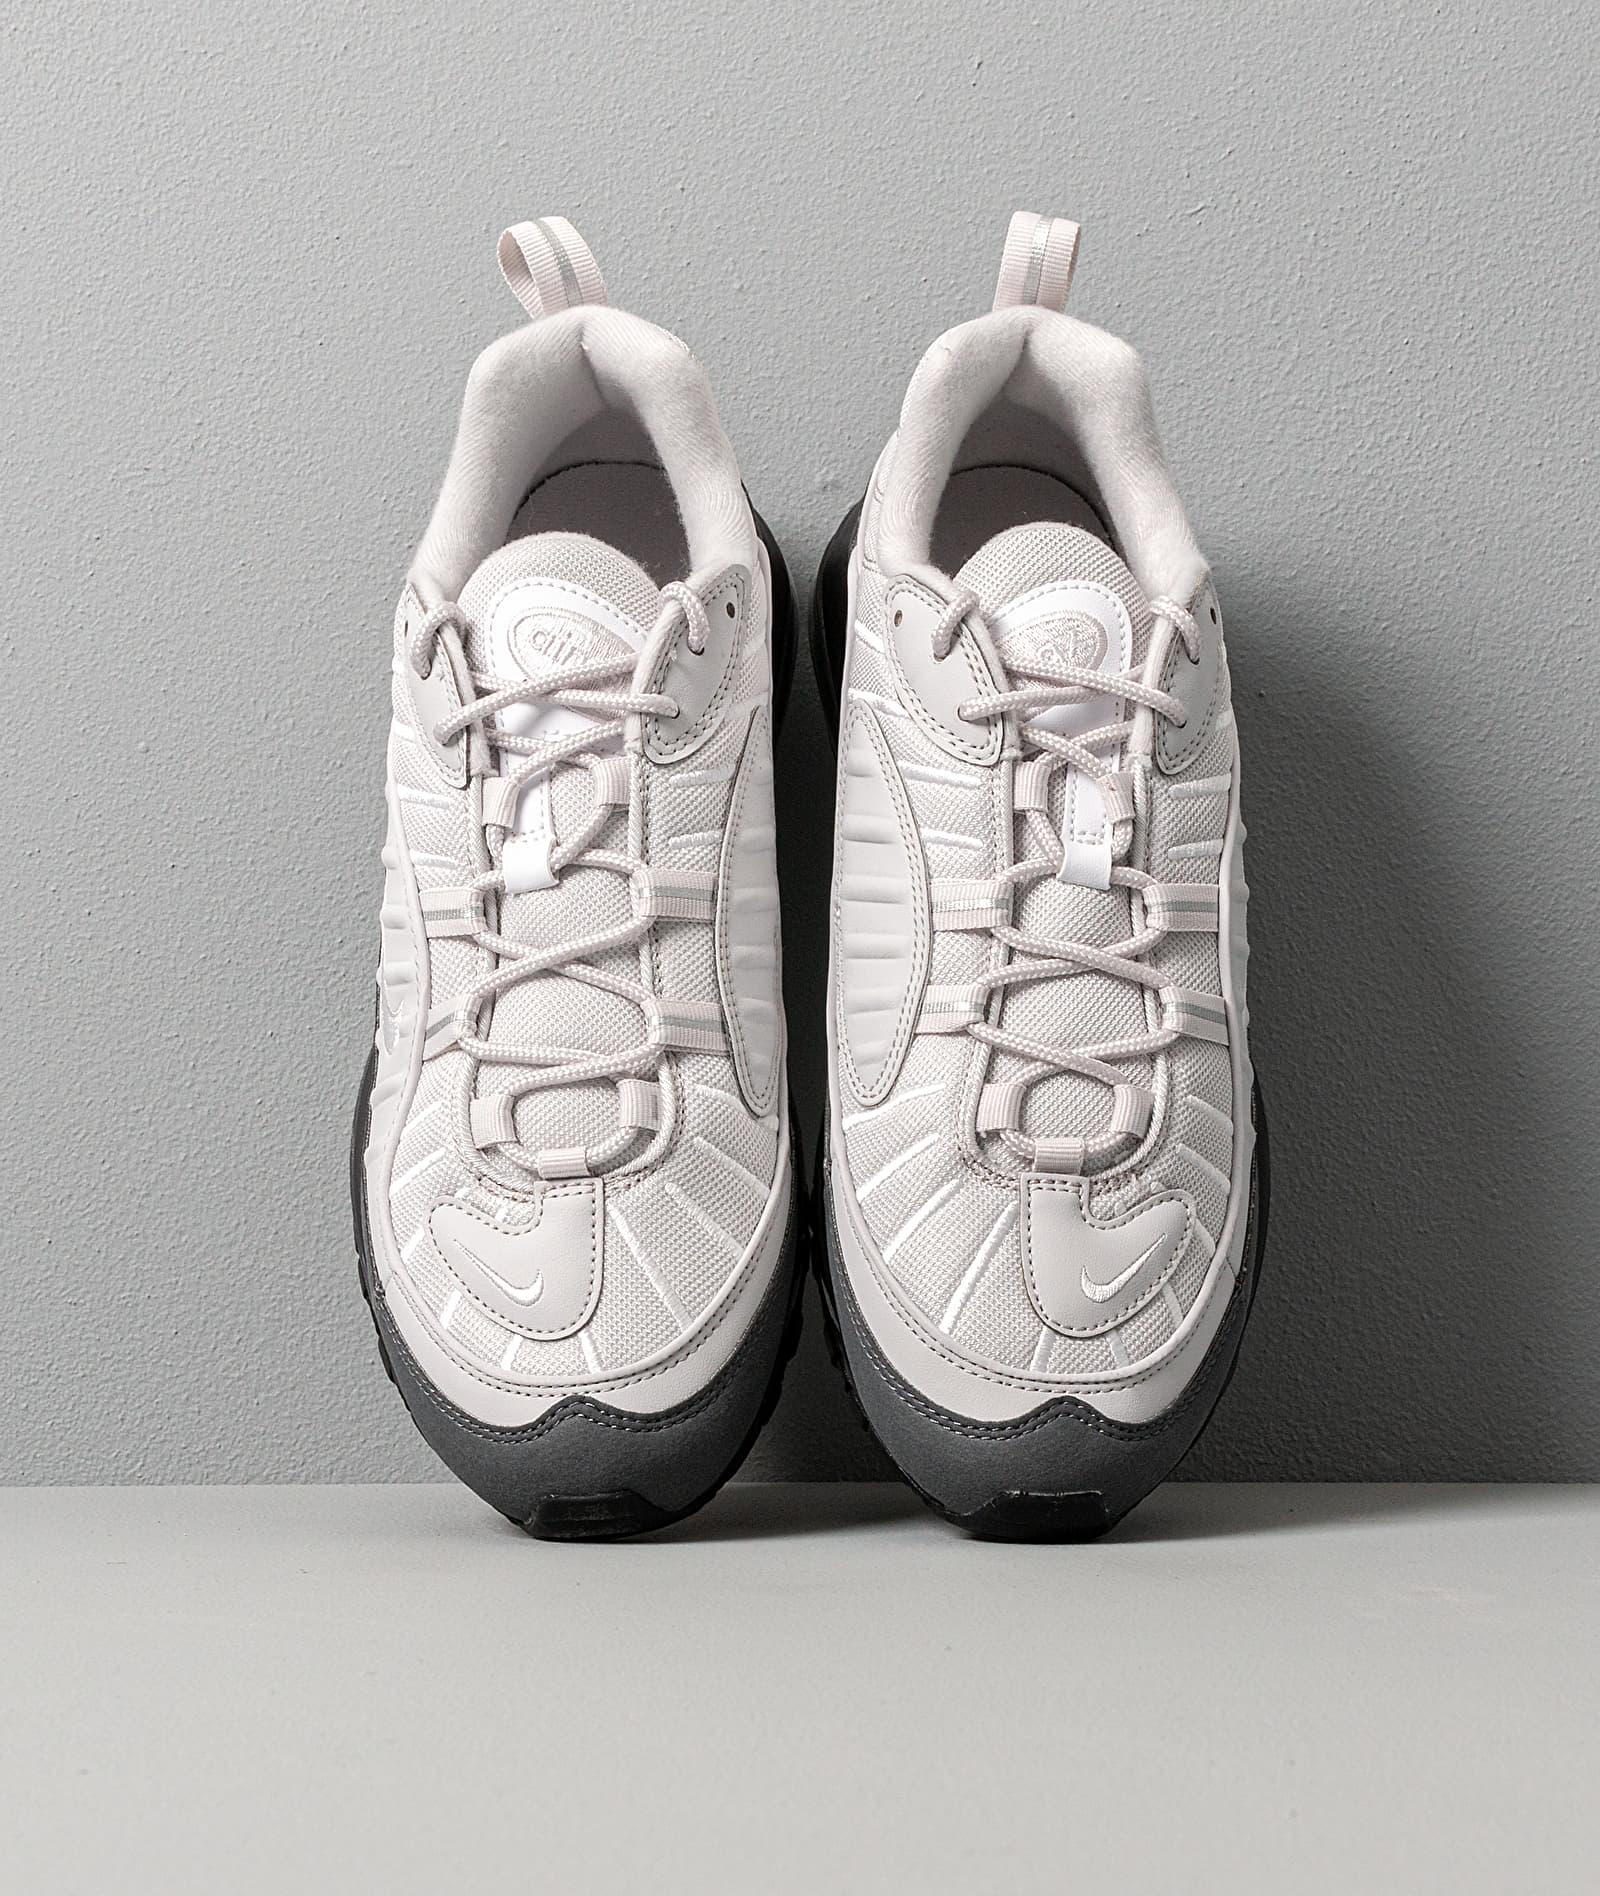 Nike Air Max 98 White/ White-Vast Grey-Dark Grey